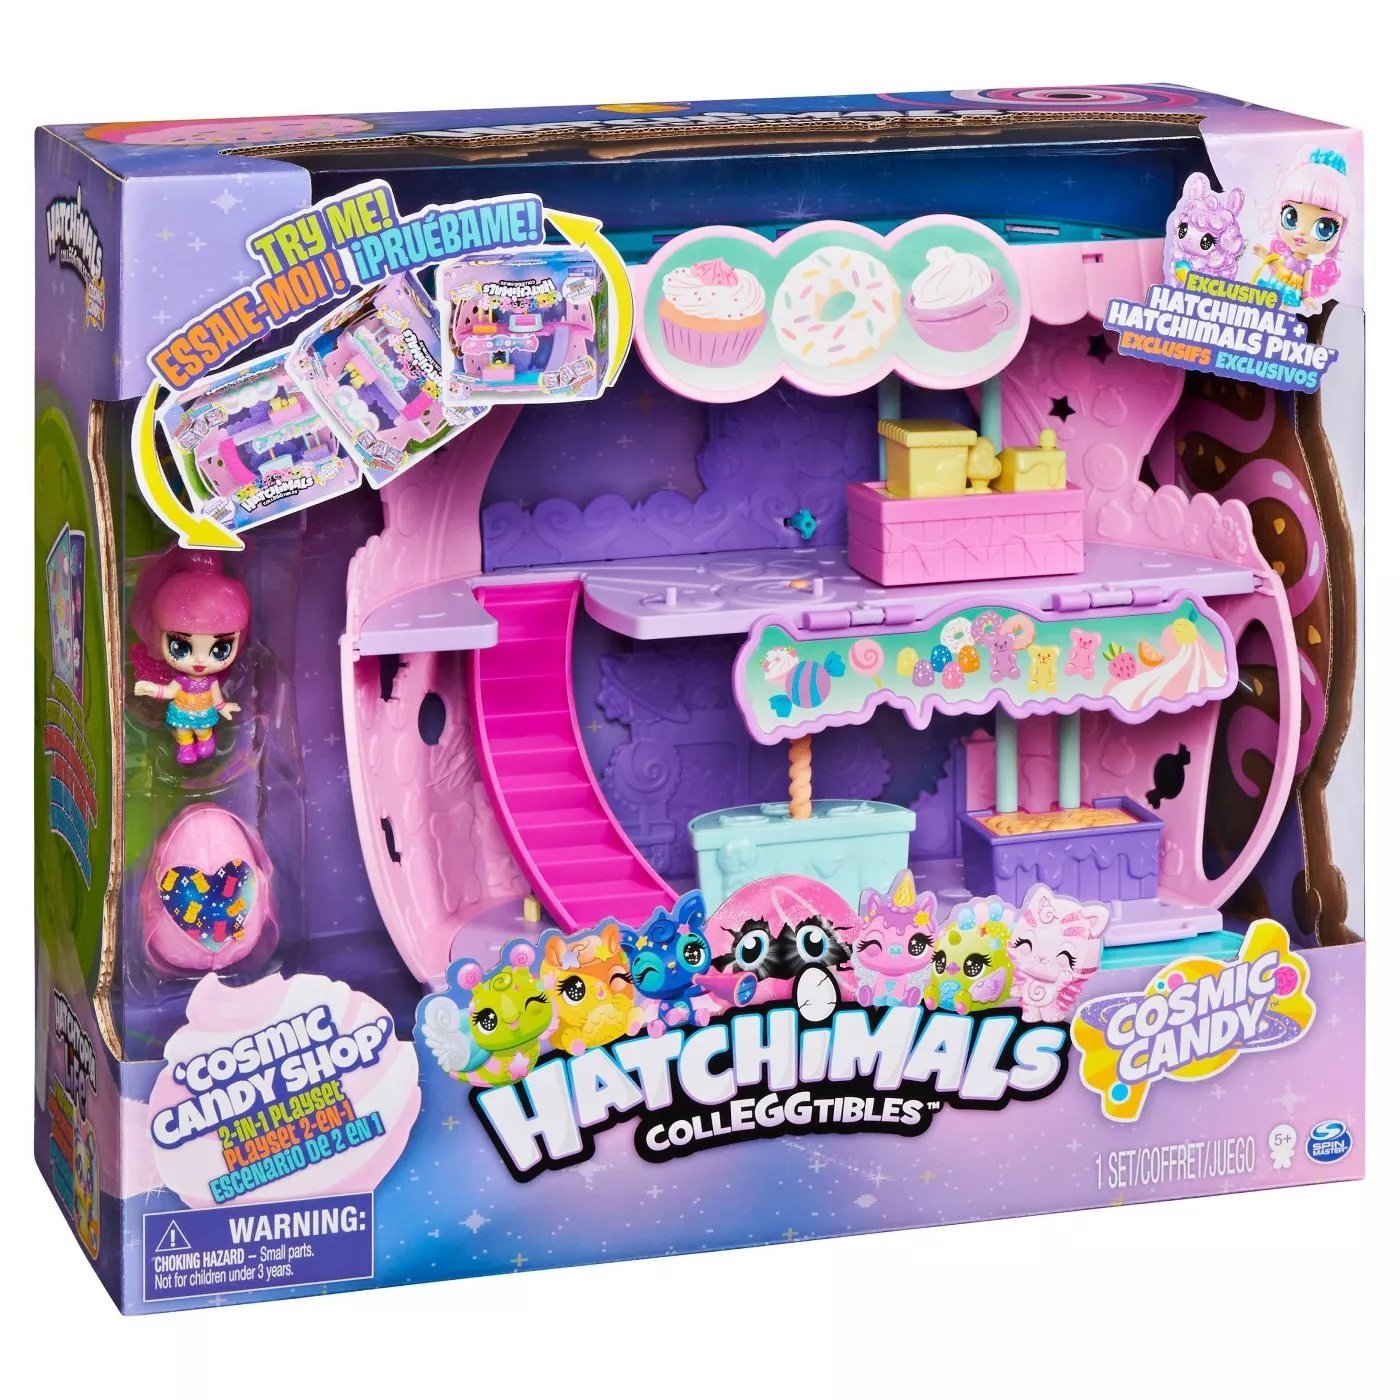 Hatchimals 迷你寵物蛋 甜蜜糖果屋 (6056543)